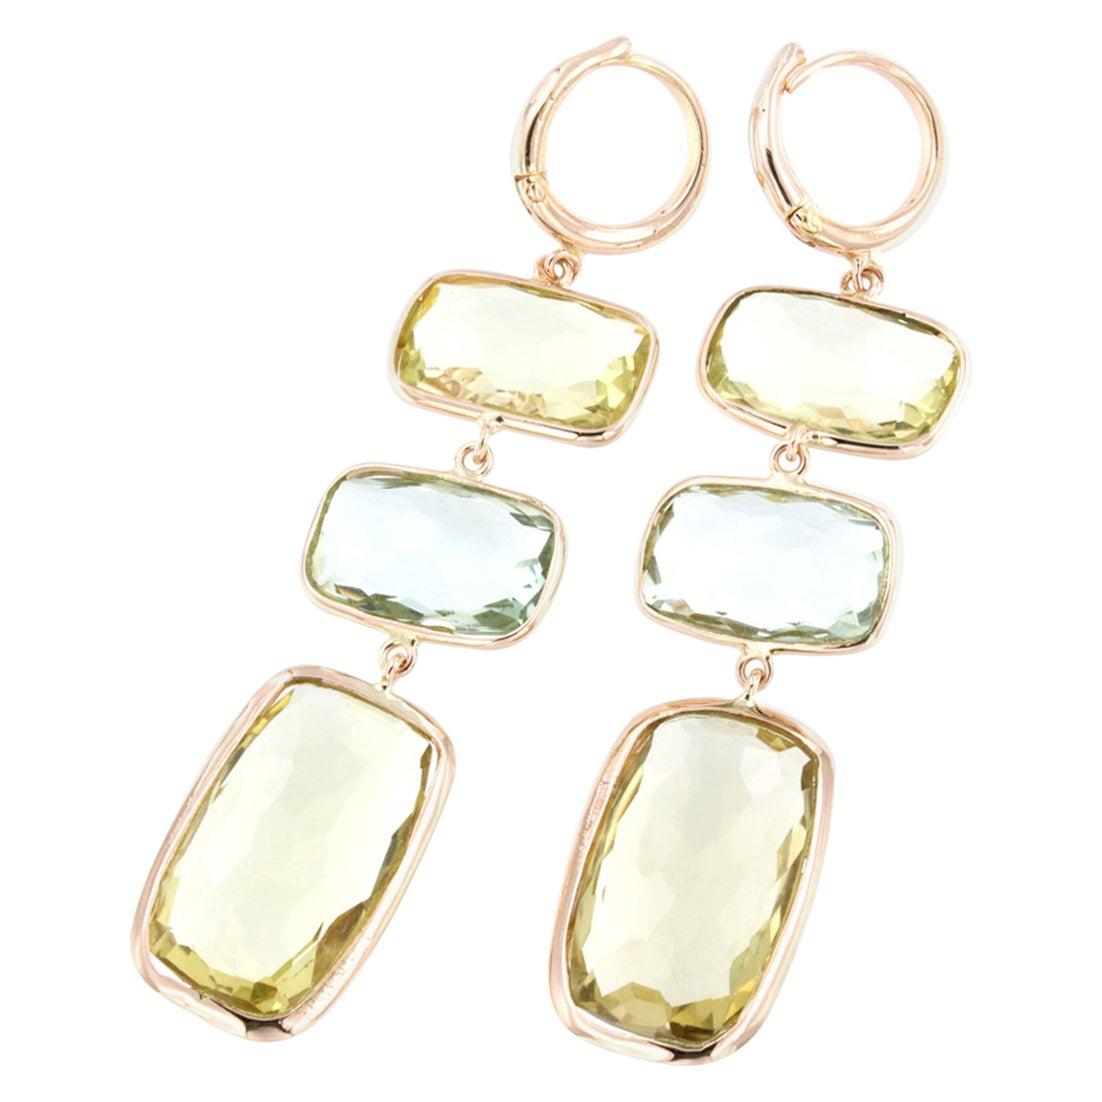 18 Karat Rose Gold with Lemon Quartz and Prasiolite Earrings